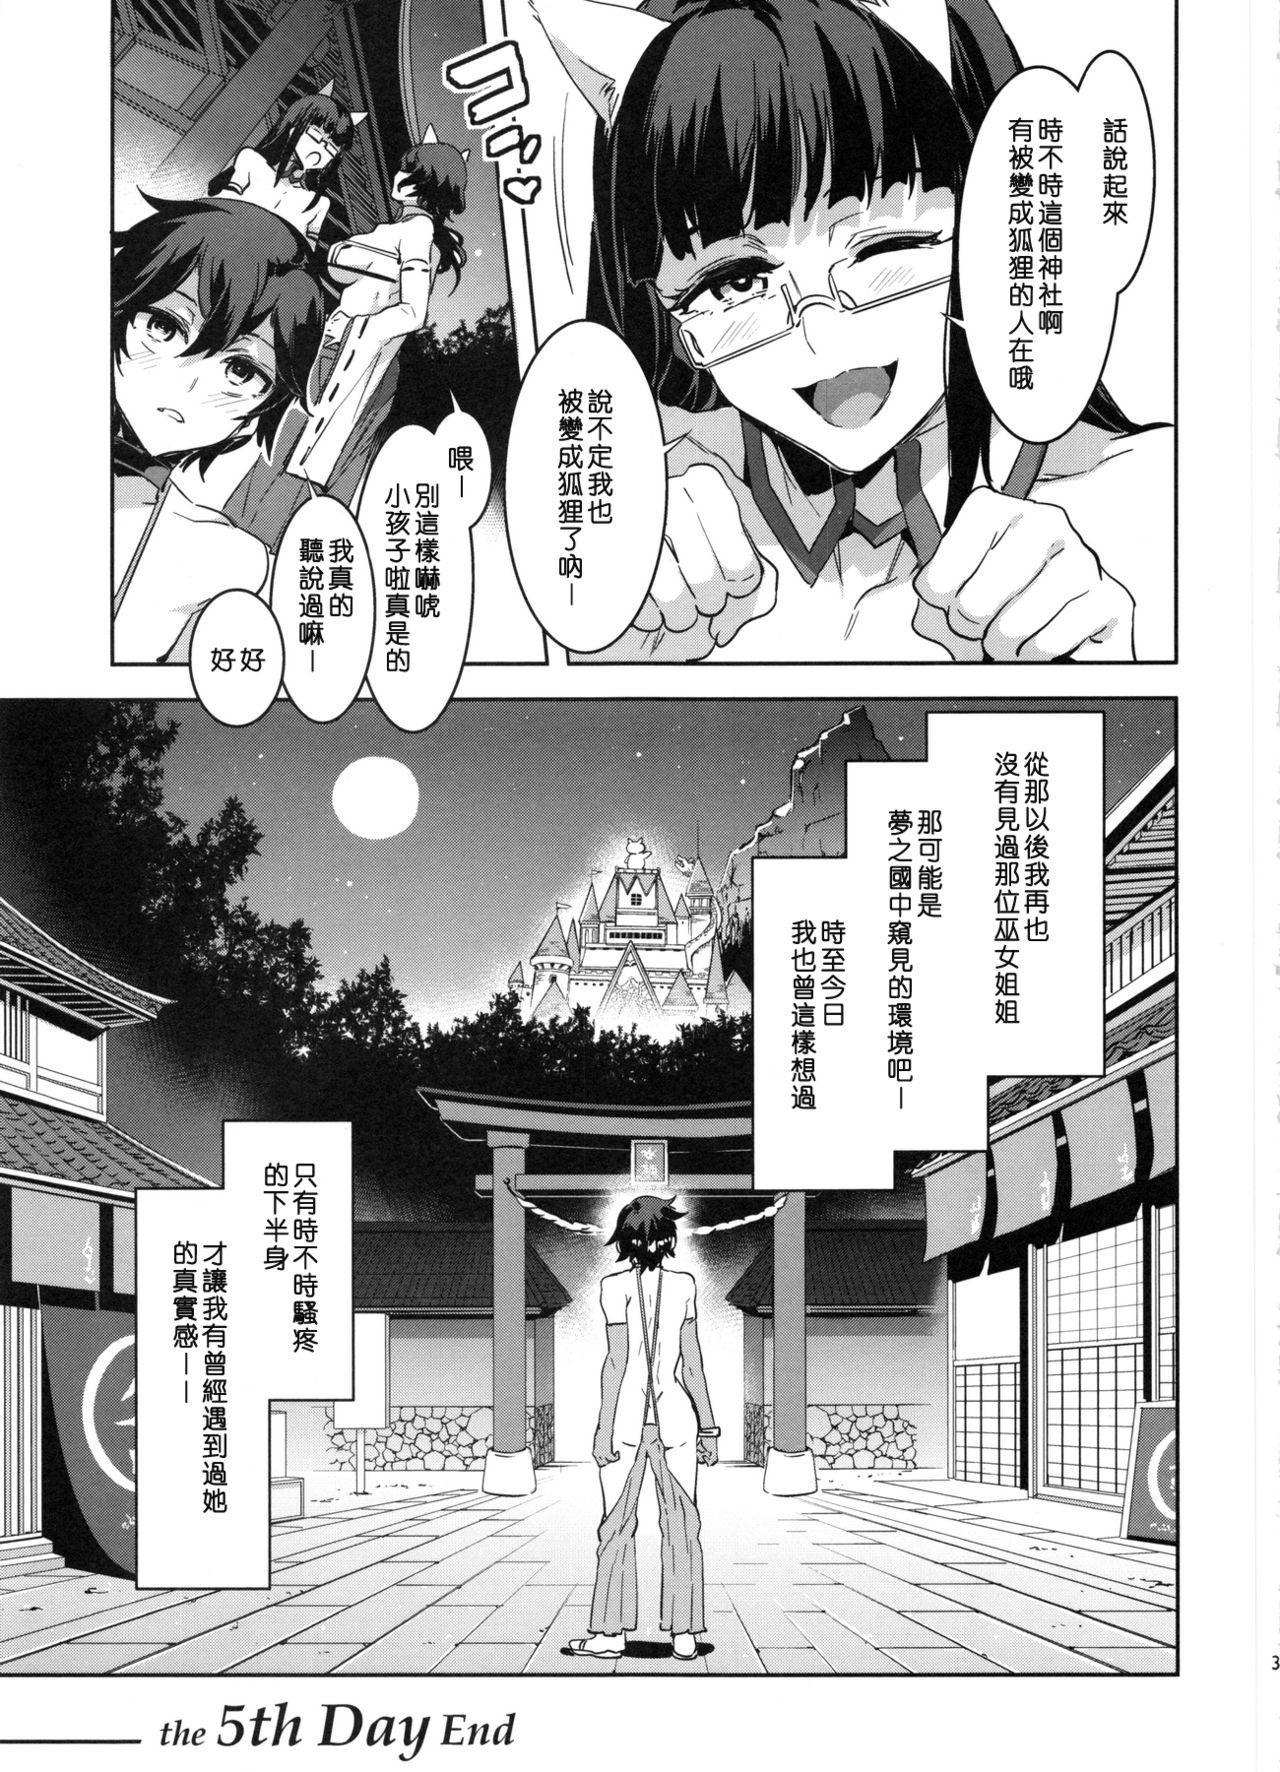 Oideyo! Mizuryu Kei Land the 5th Day 33